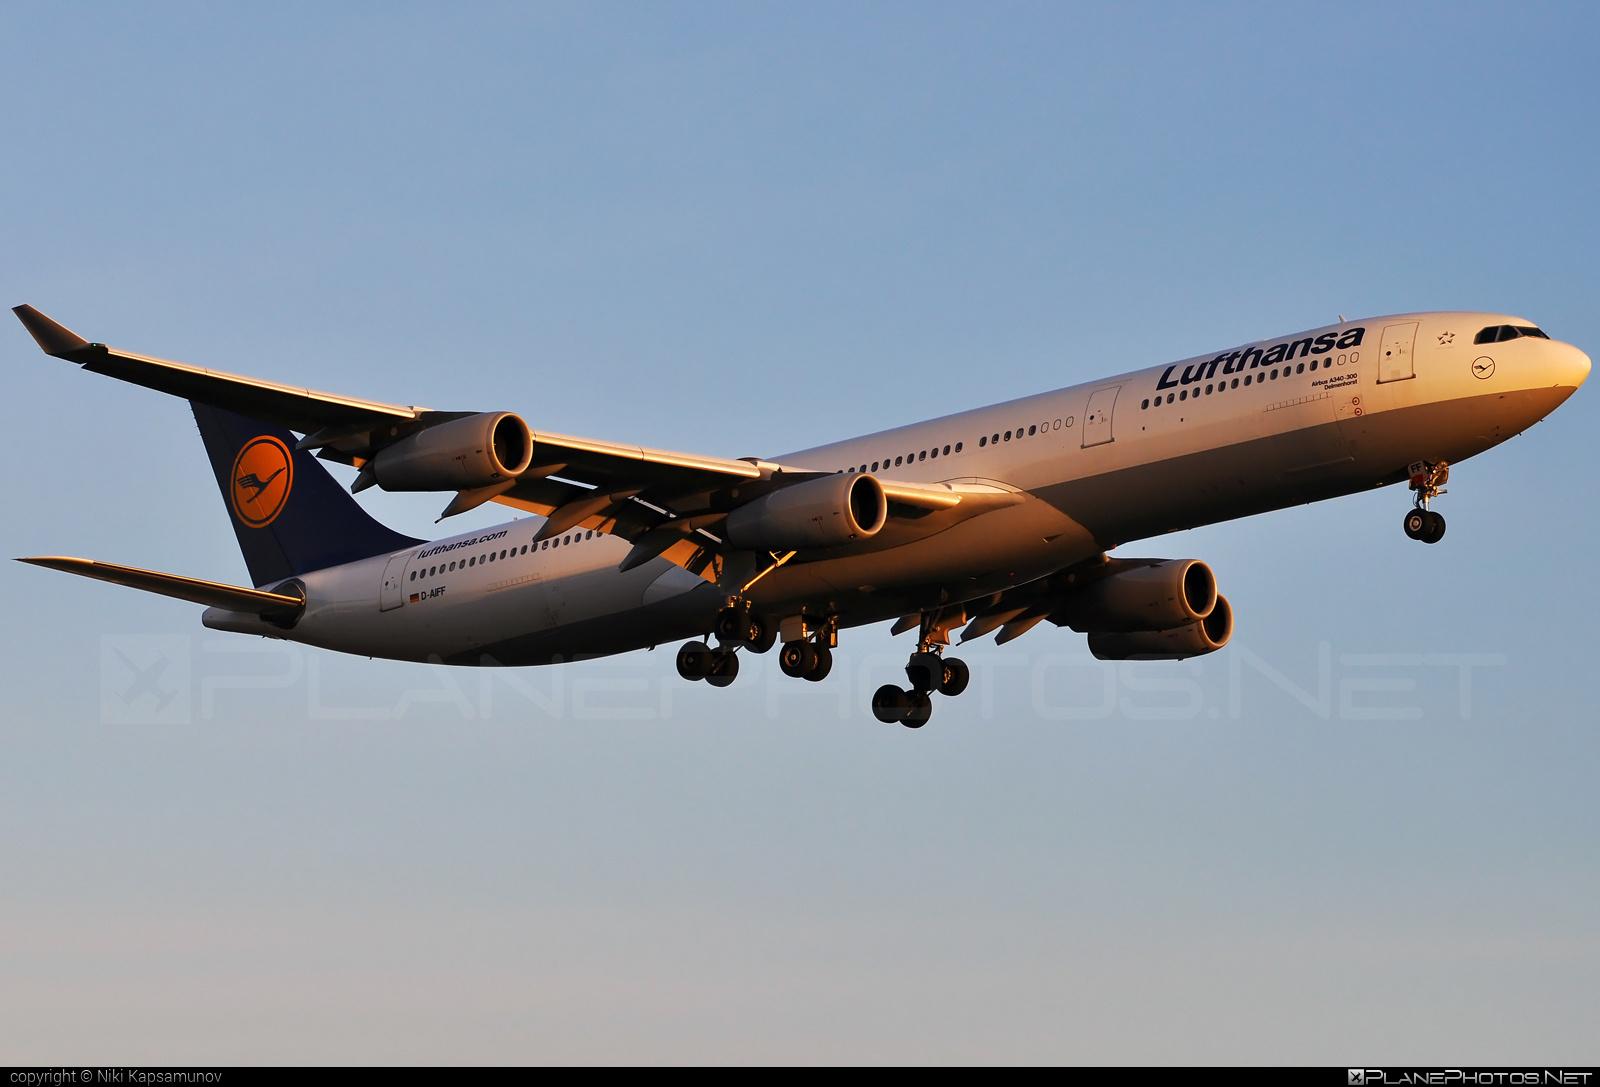 Airbus A340-313 - D-AIFF operated by Lufthansa #a340 #a340family #airbus #airbus340 #lufthansa